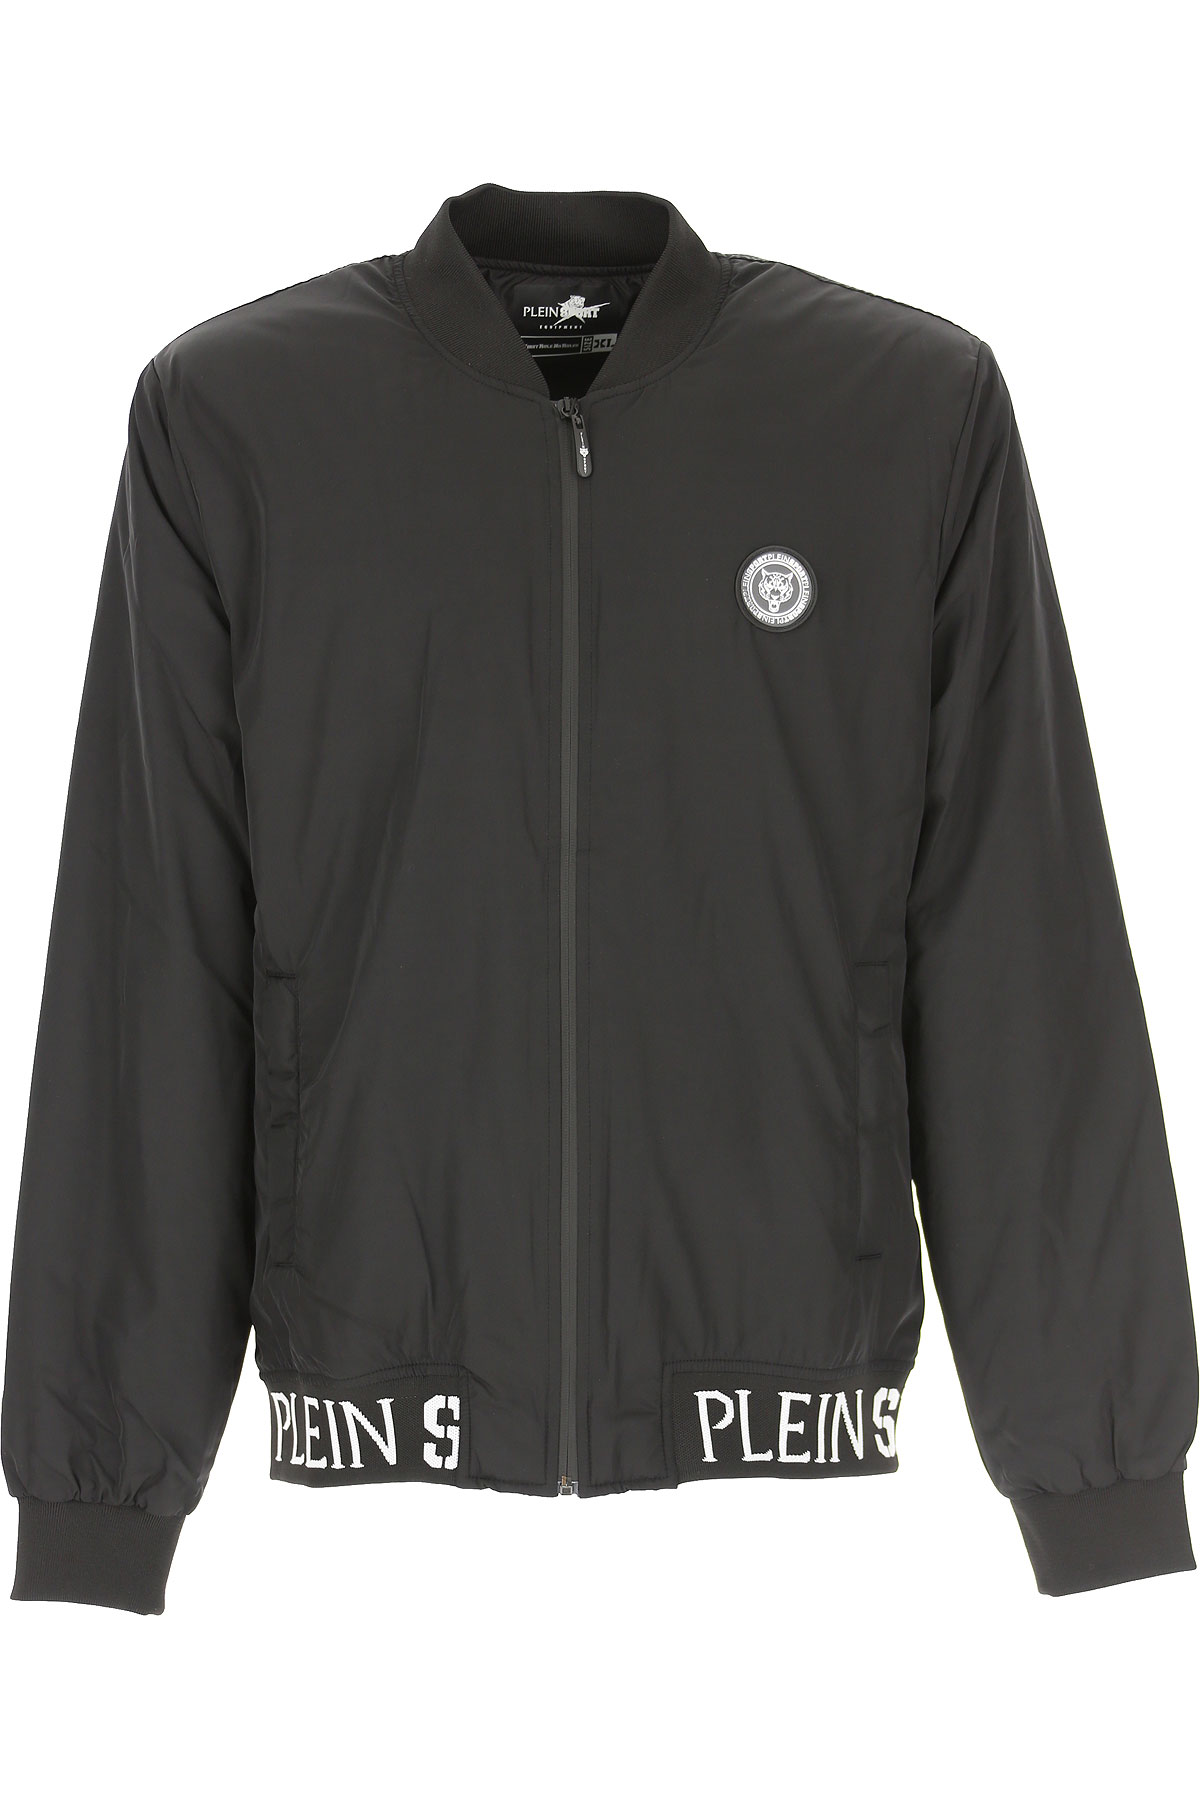 Philipp Plein Jacket for Men On Sale, Black, polyester, 2019, L M S XL XXL